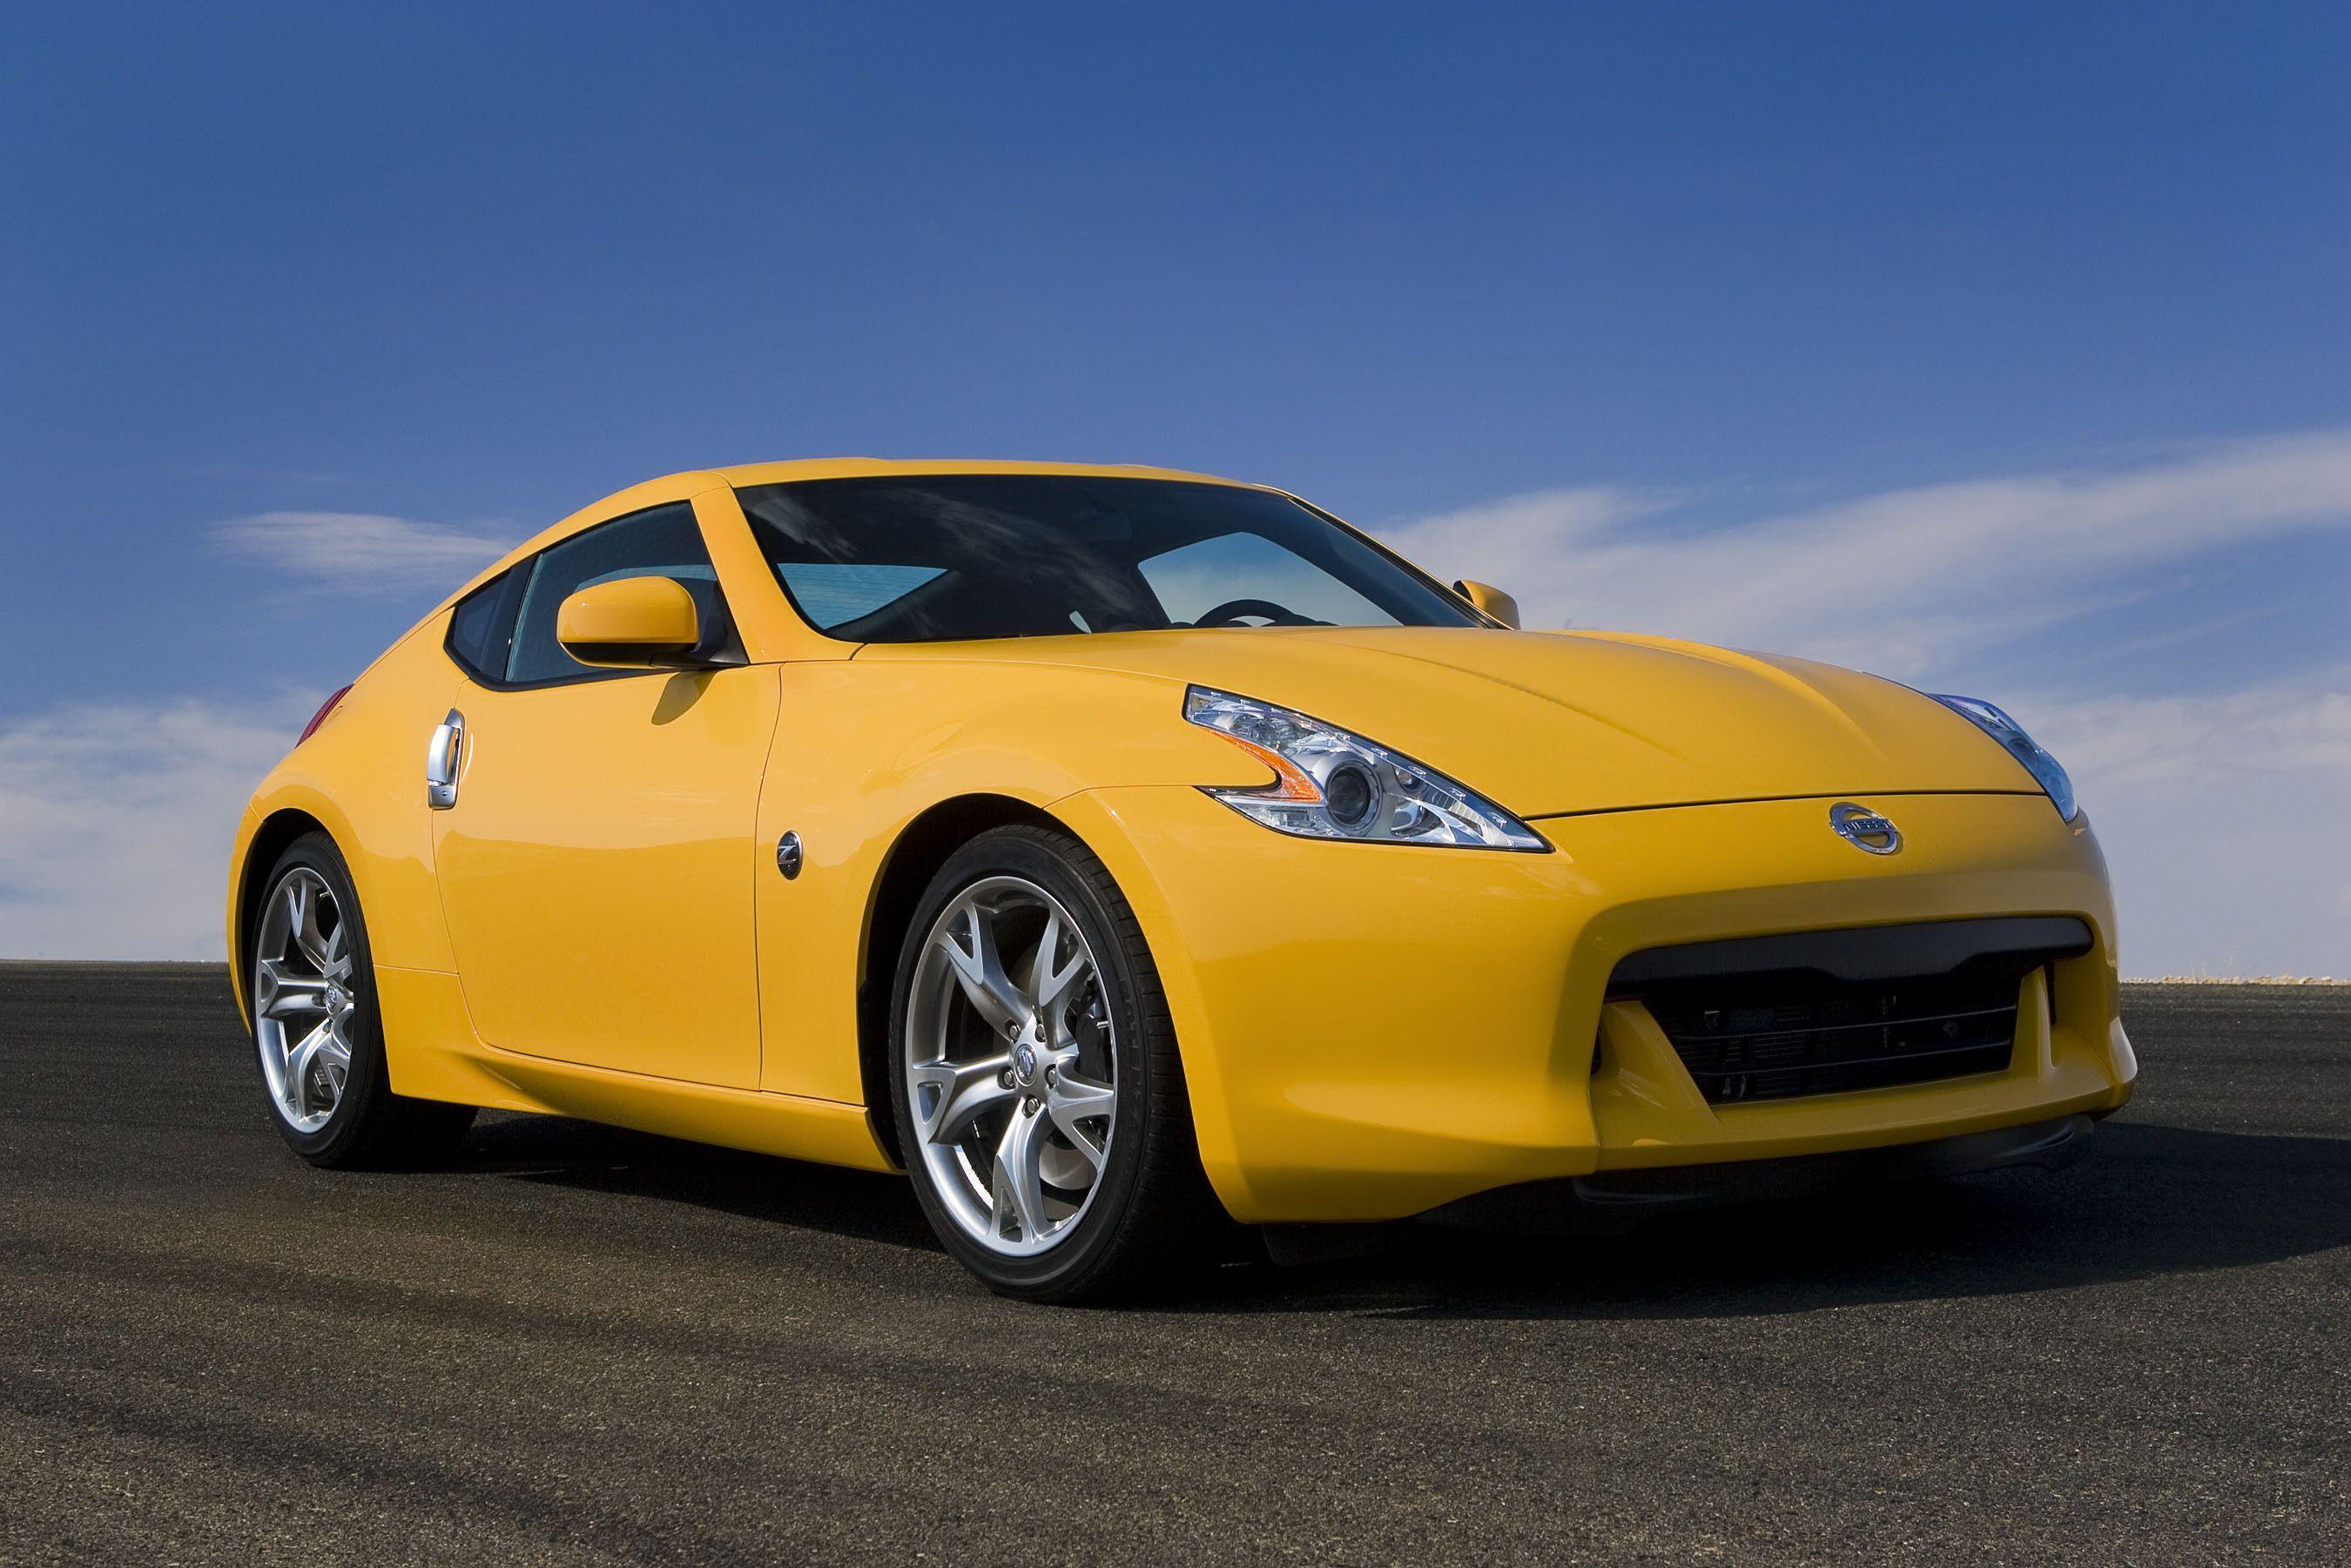 Yellow nissan 370z roadster nissan pinterest nissan 370z yellow nissan 370z roadster vanachro Image collections